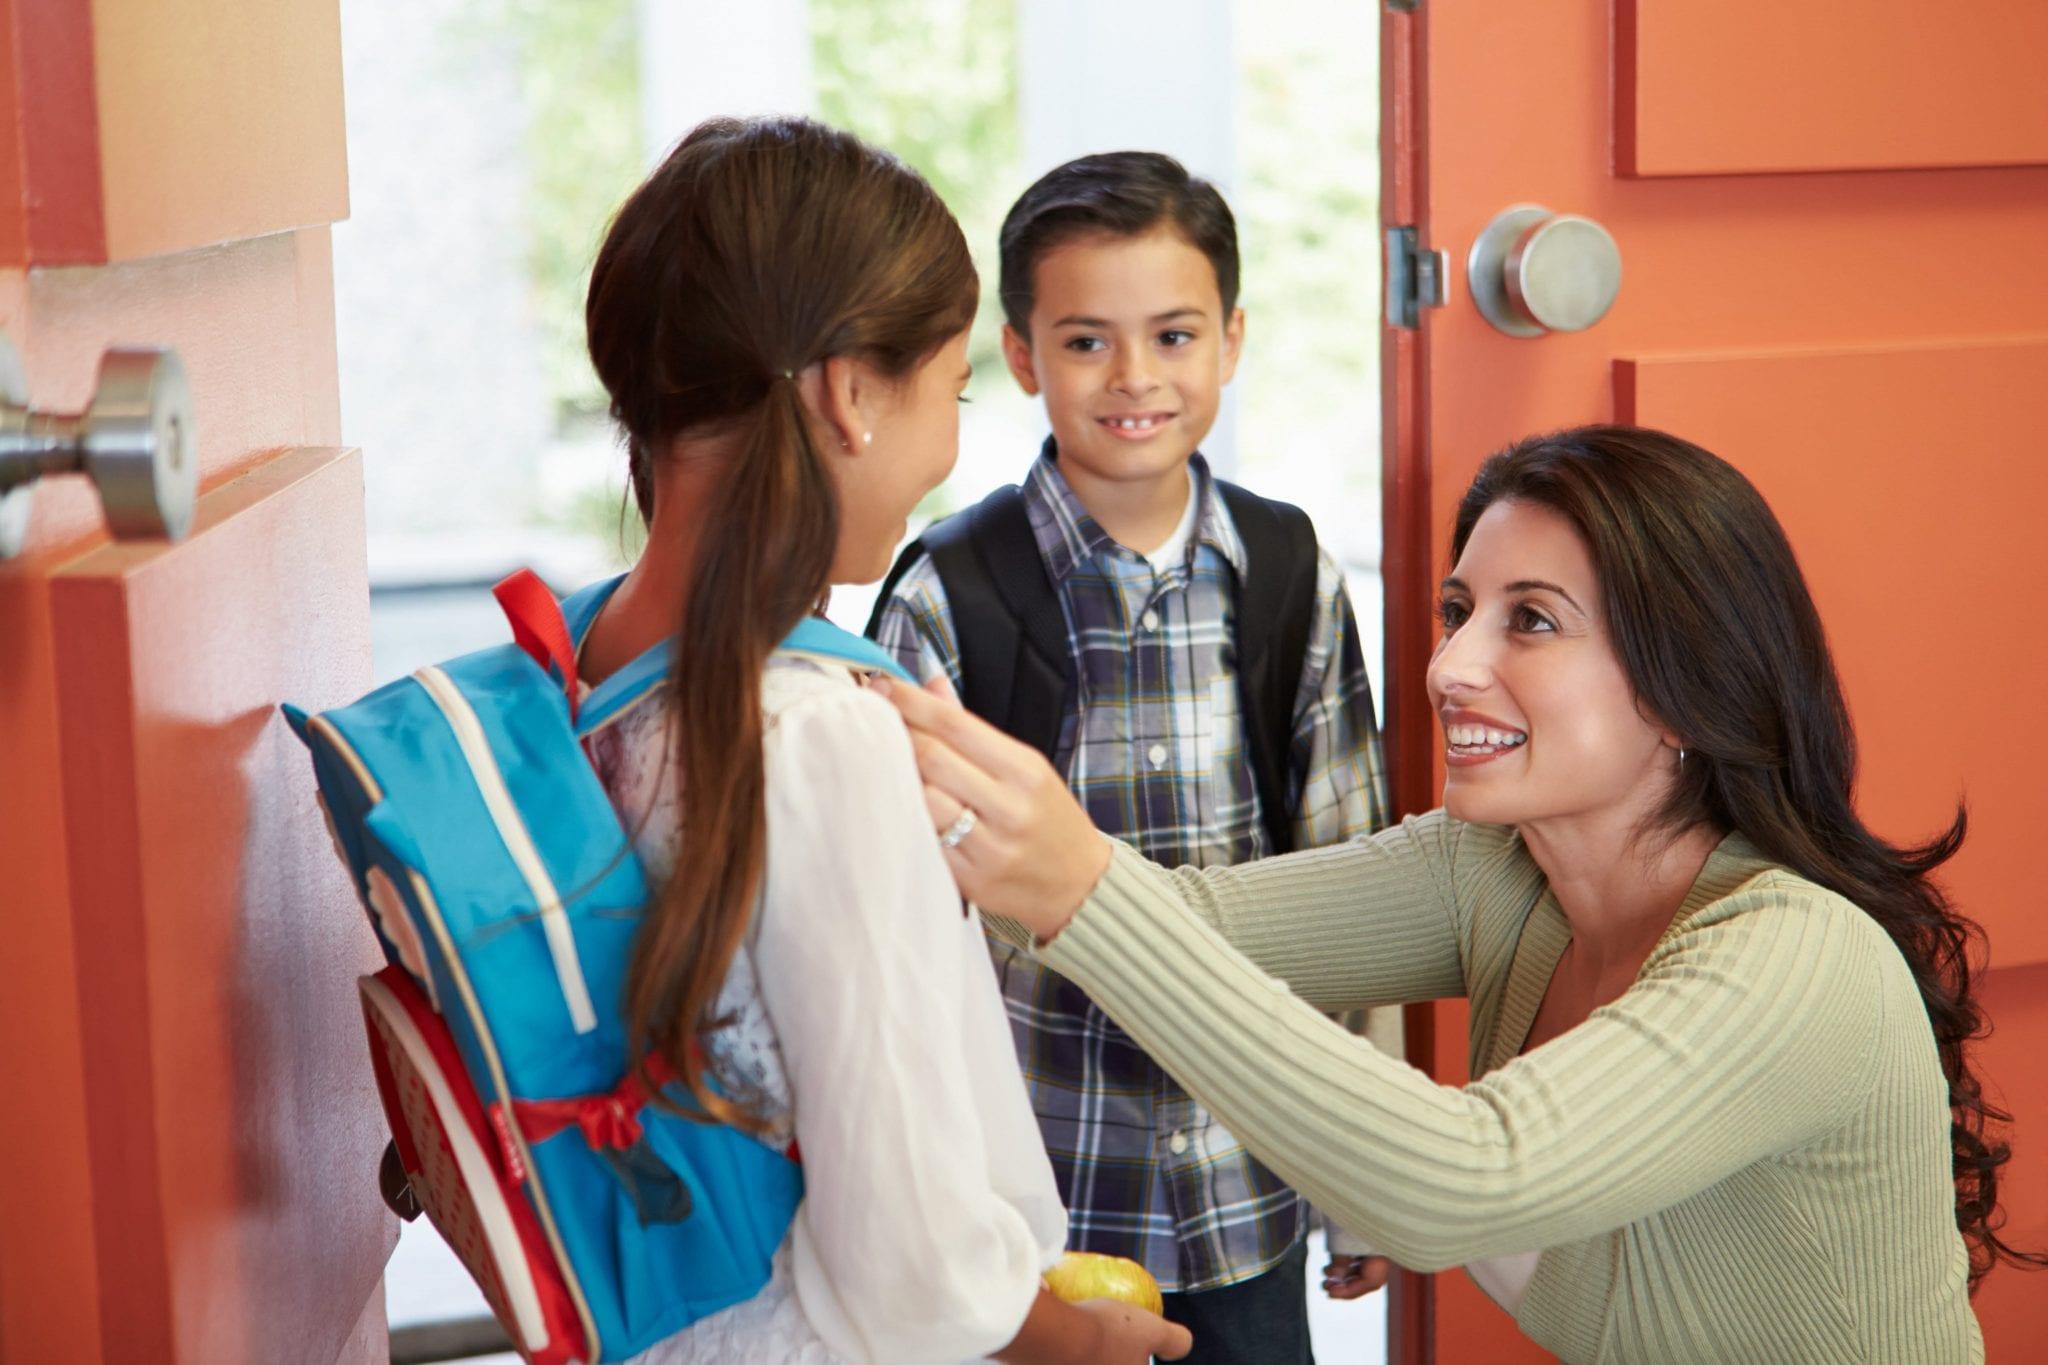 Parent Involvement In K12 Education - What Happens When Children Lack Parent Involvement In K12 Education